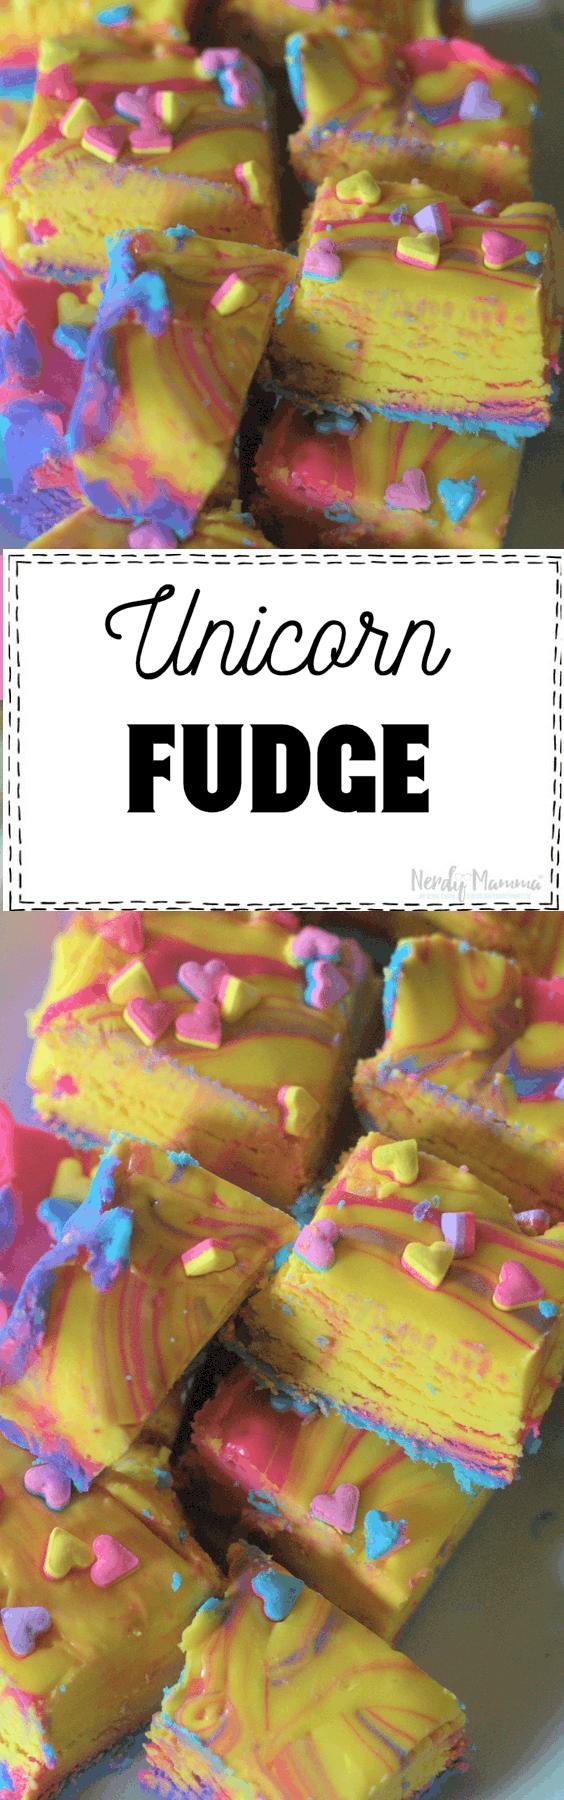 Holy moley! This Unicorn Fudge recipe is dairy-free and rainbow! LOVE!